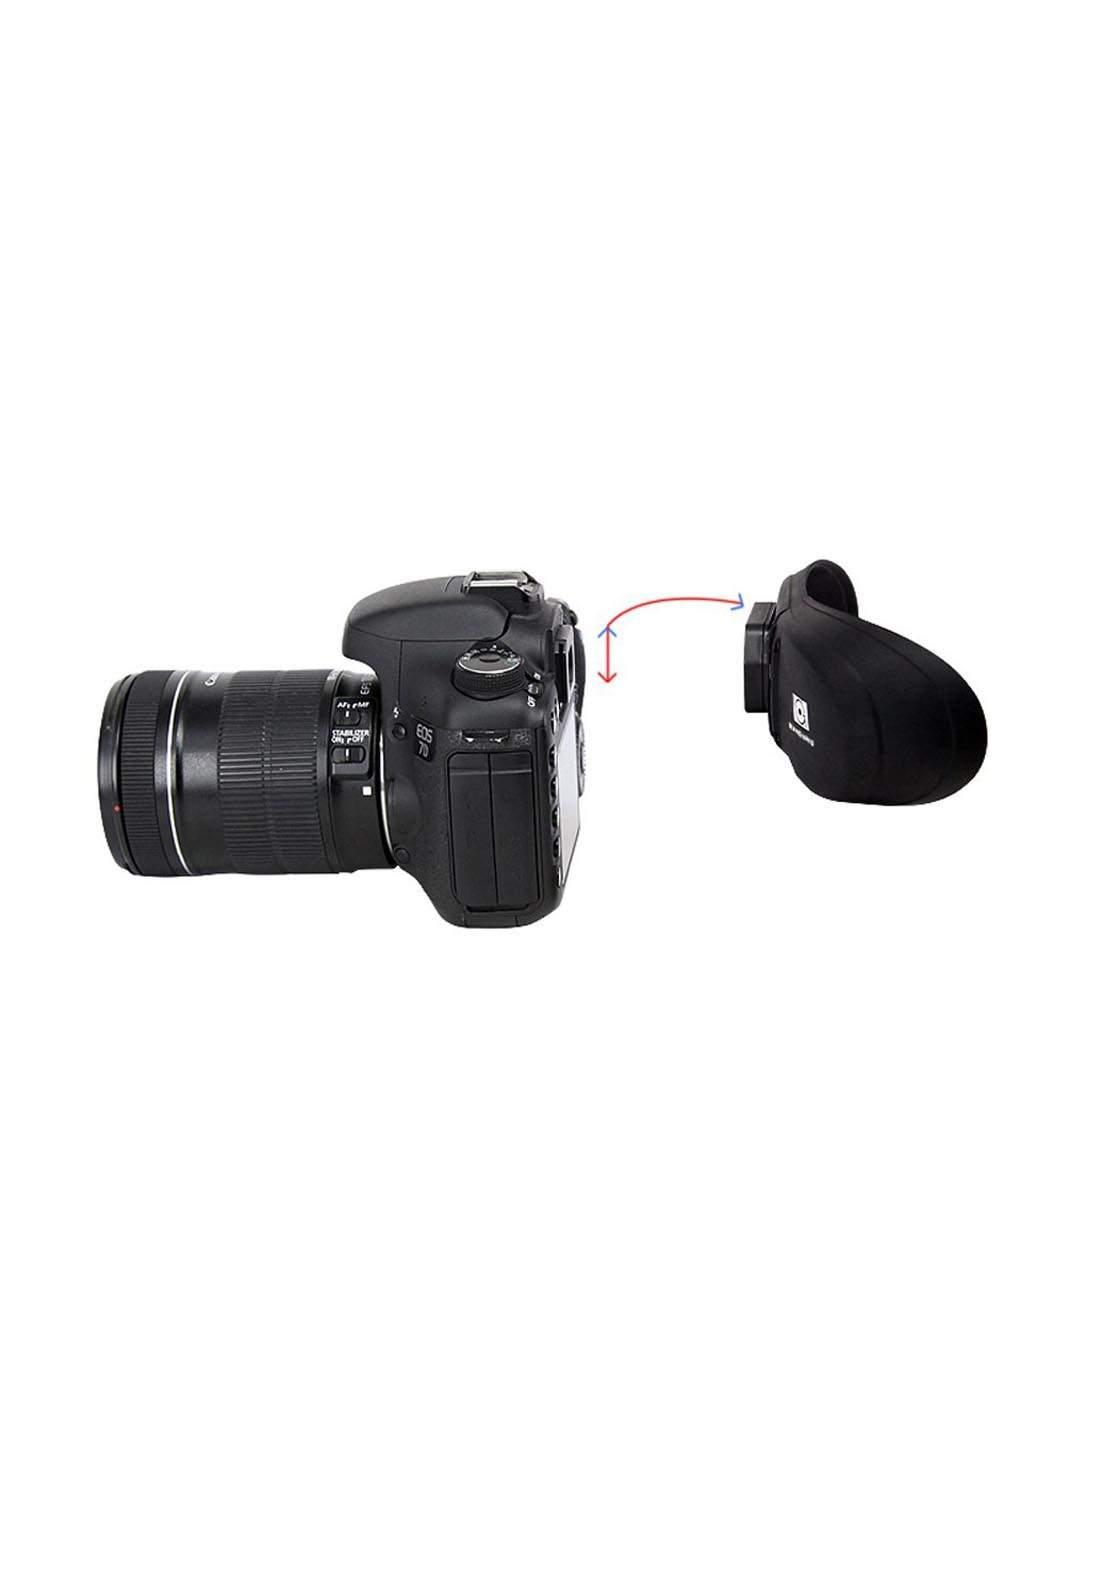 NanGuang CN-2CL Camera Binocular-Fixation Shade Blinder -  Black